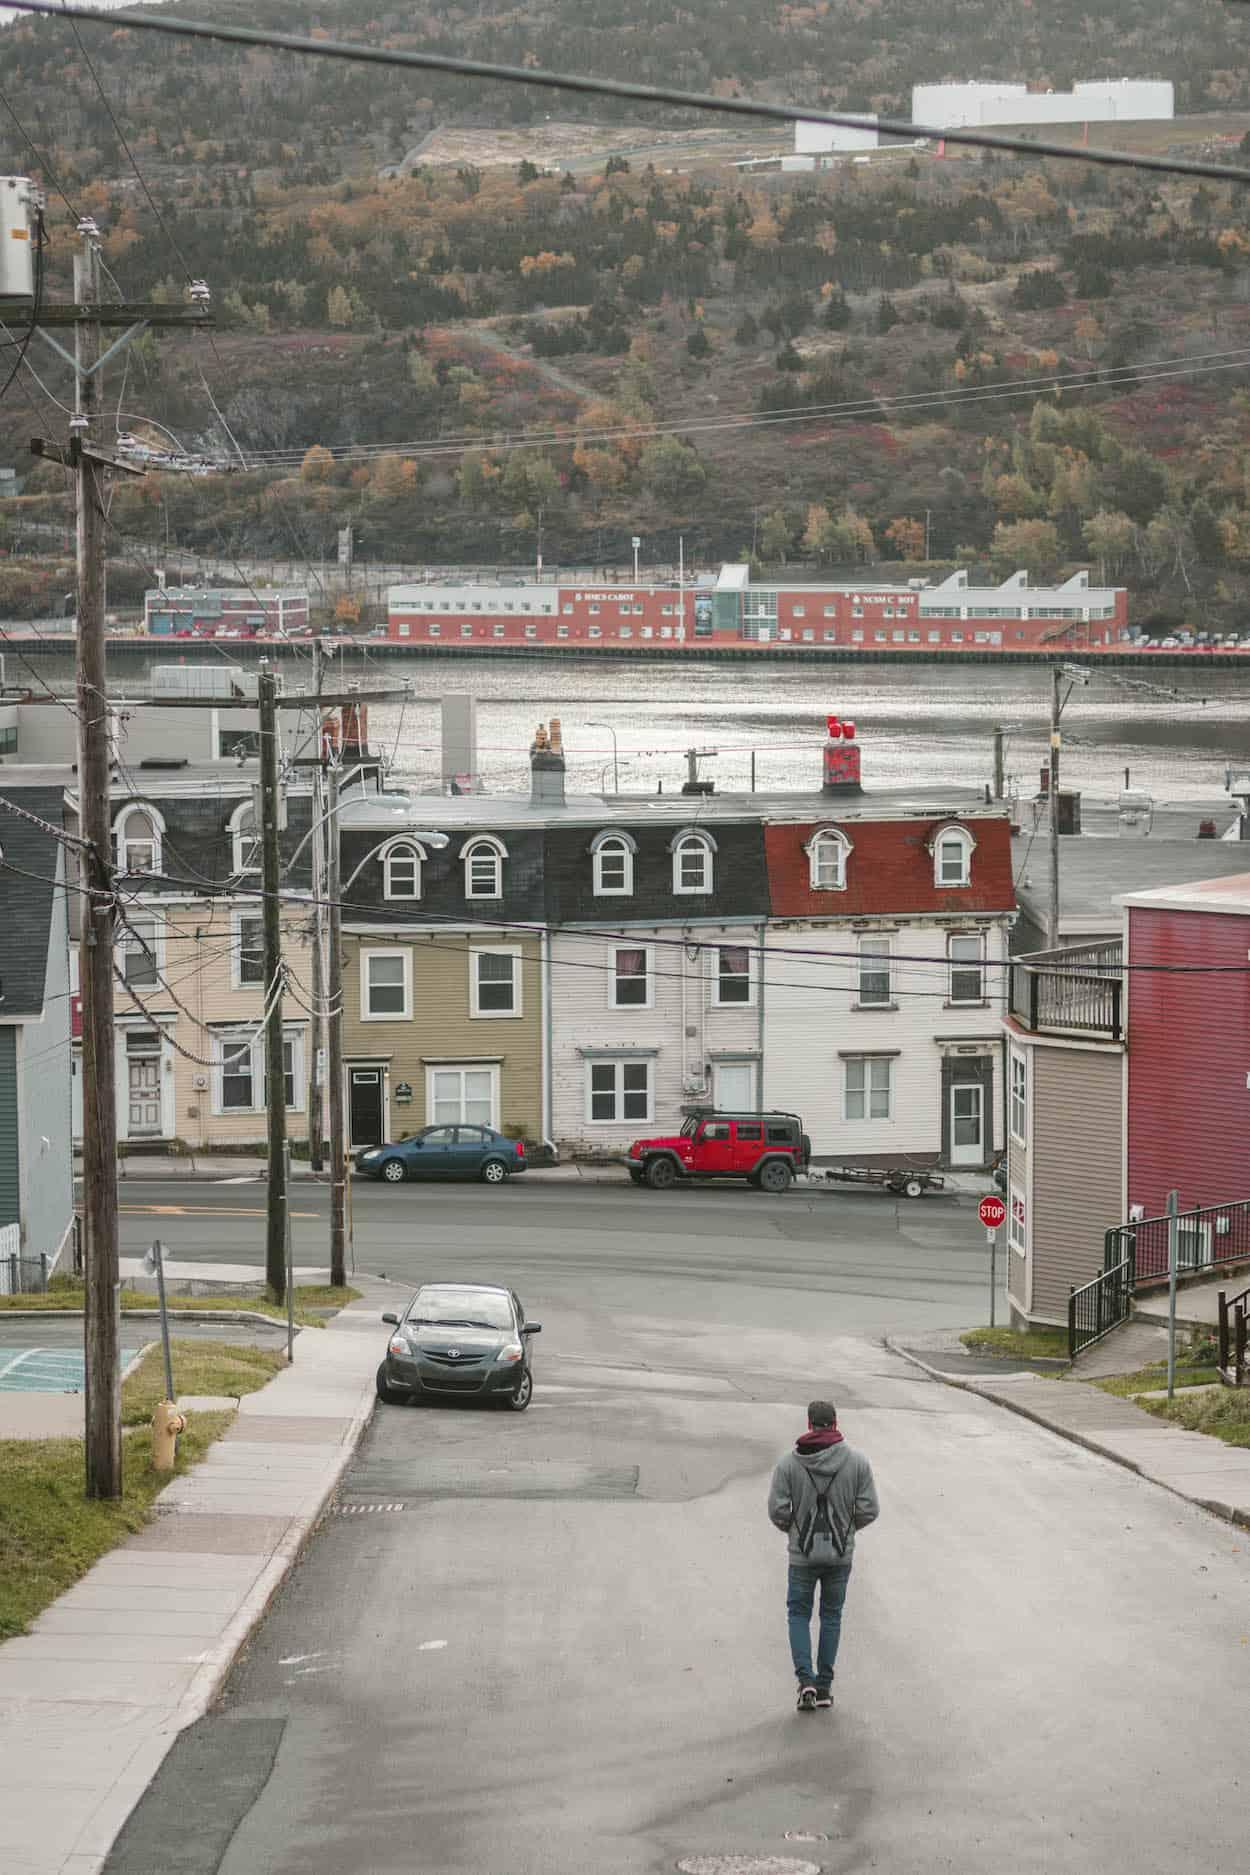 Downtown St. John's, Newfoundland